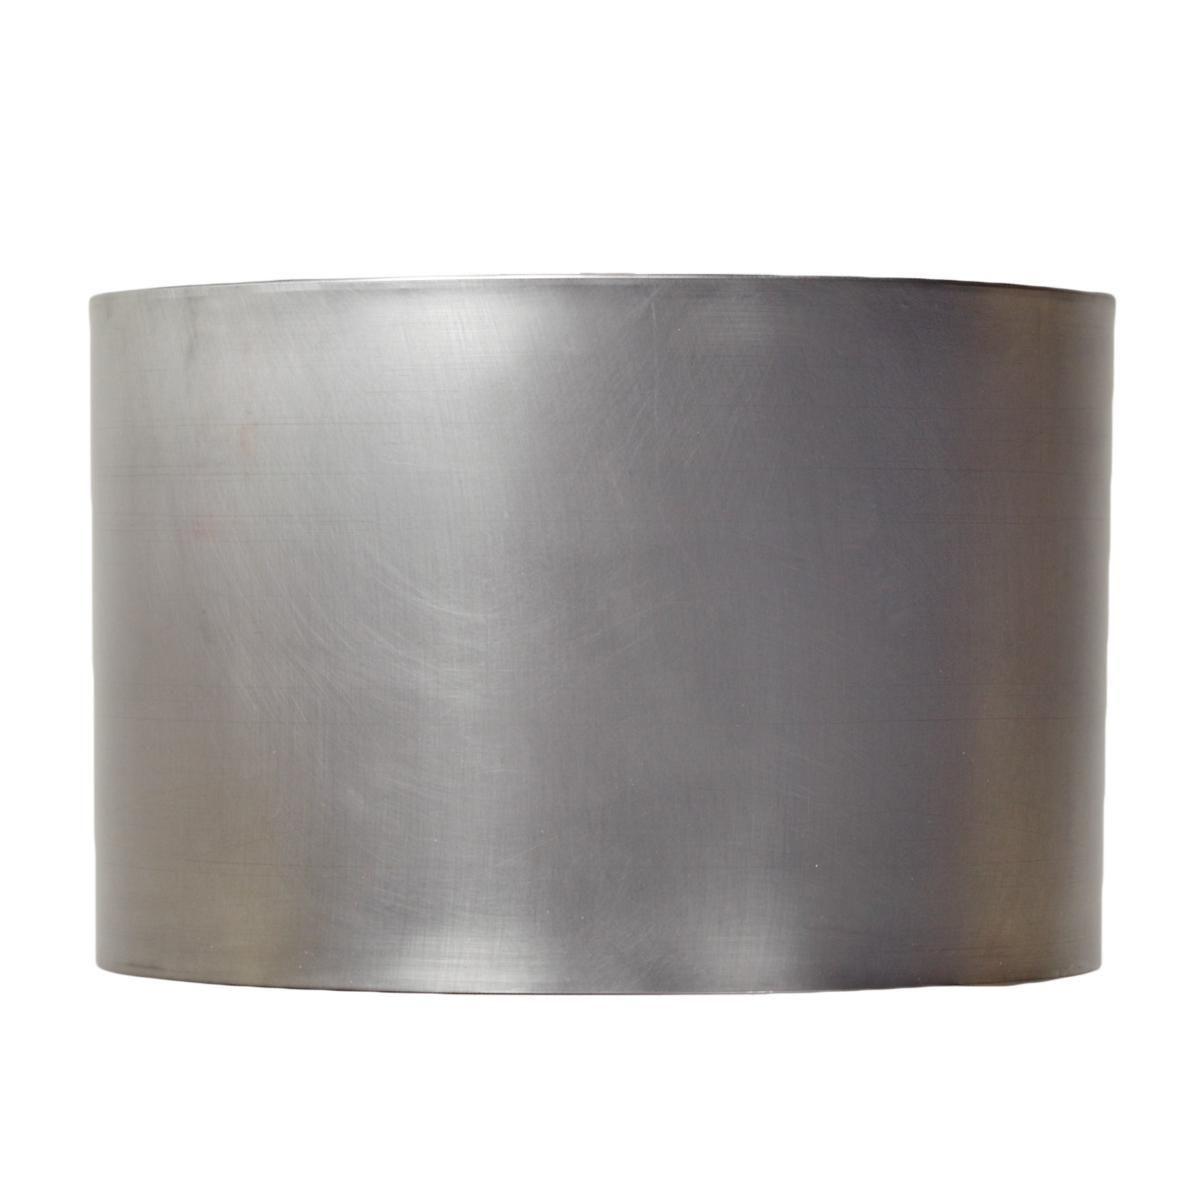 16 Metal Drum Lampshade Pewter Black Or Gold Metal Drum Shade Drum Lampshade Metal Drum